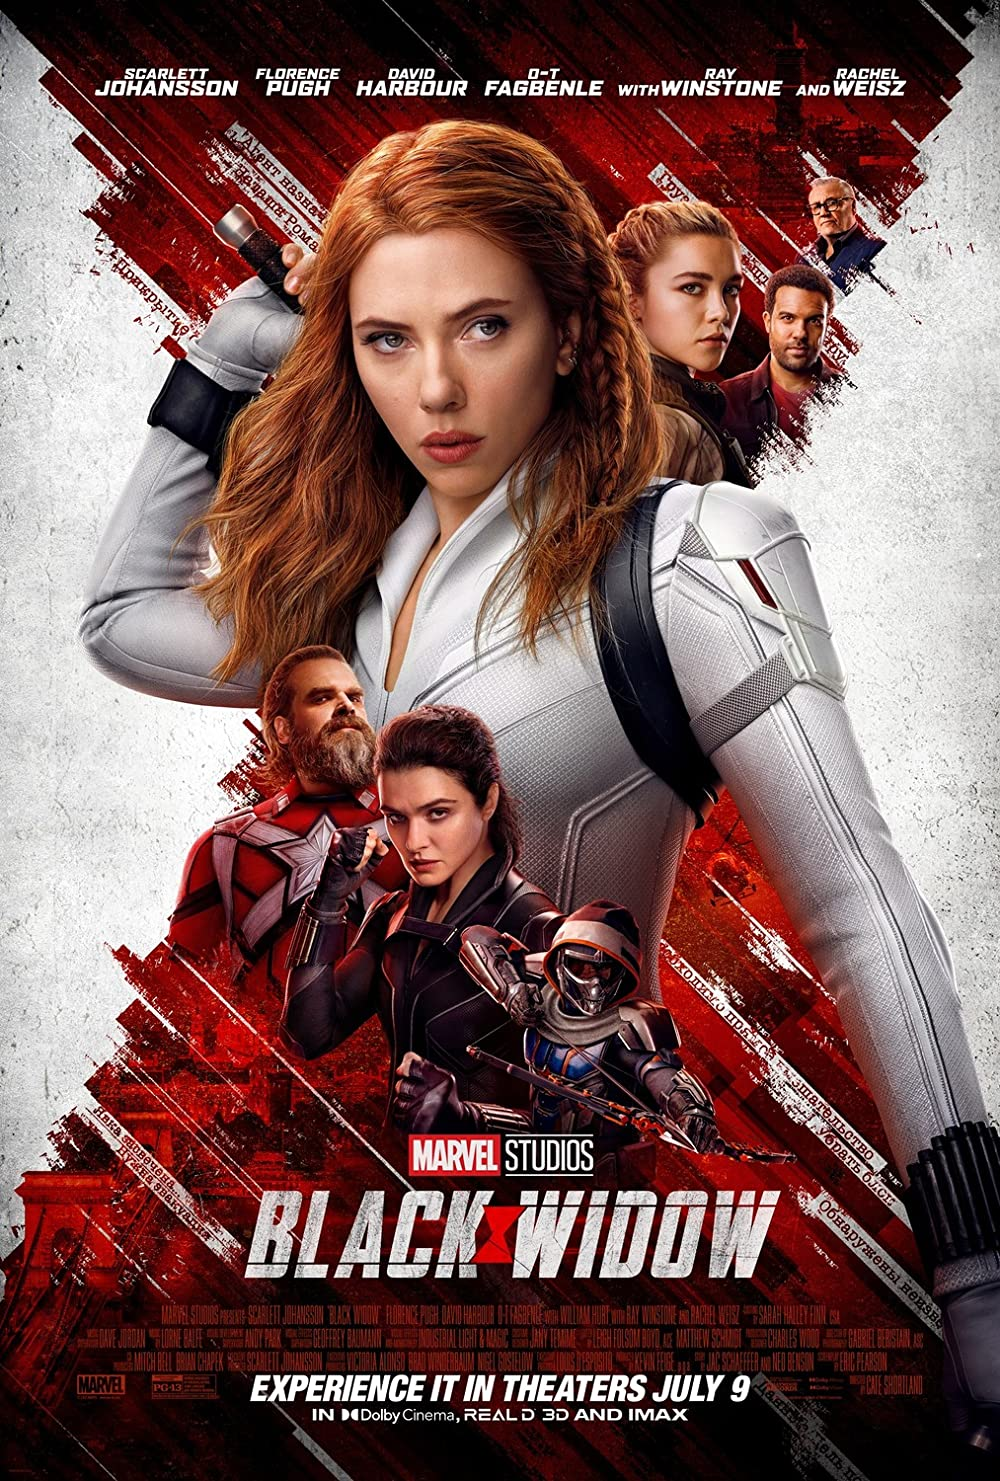 Summer of Cinema: Black Widow